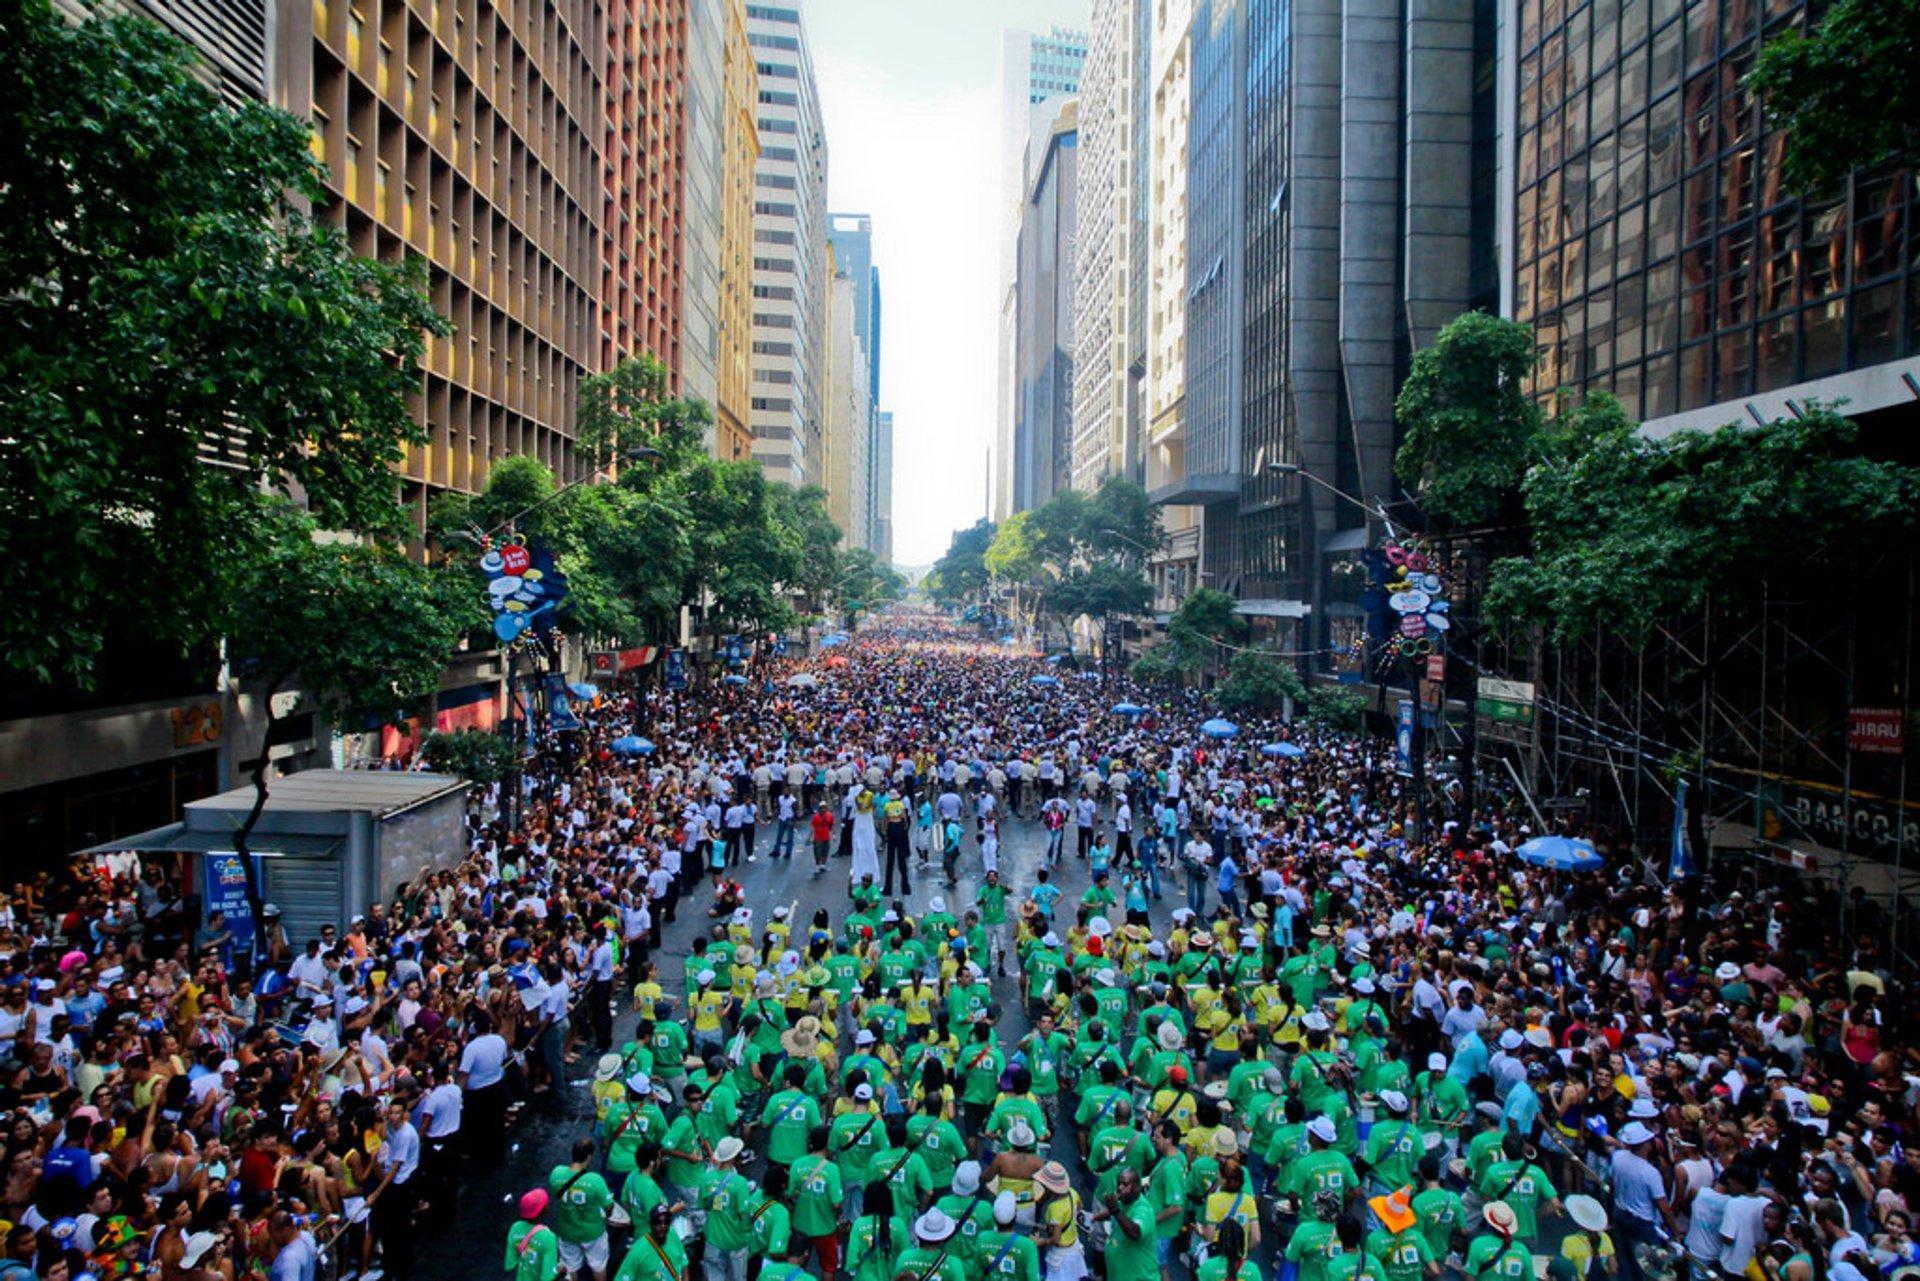 Blocos in Rio de Janeiro 2019 - Best Time